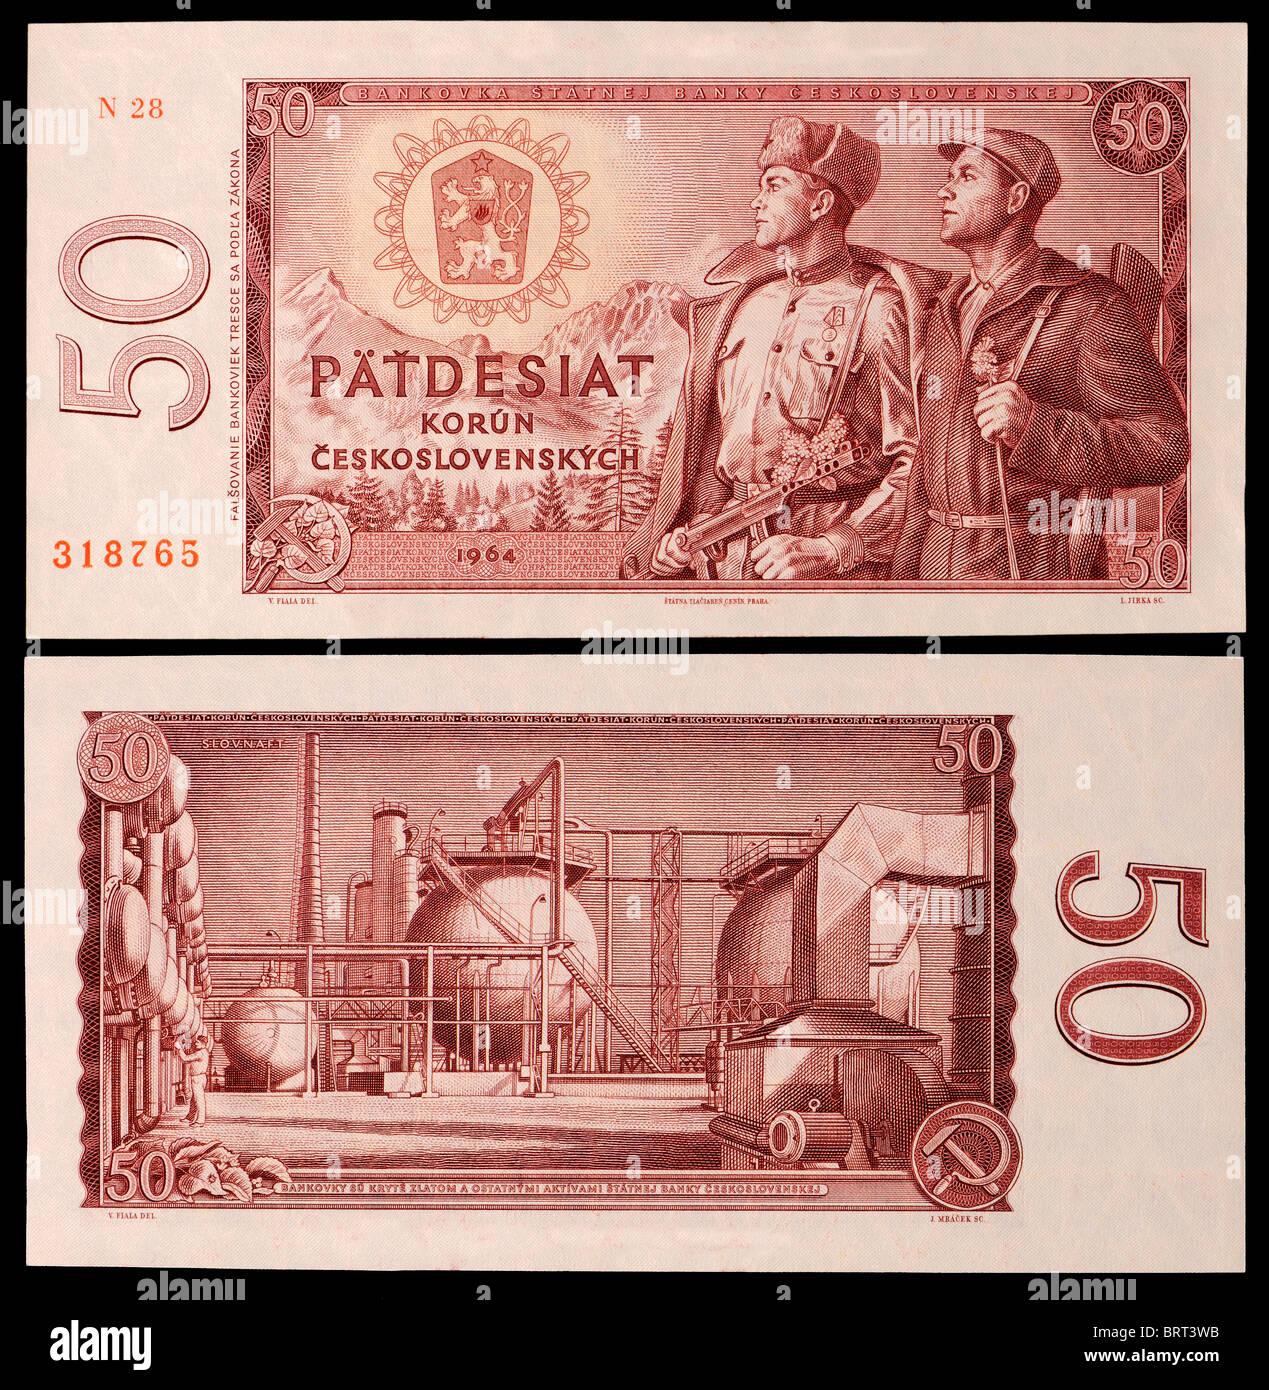 Czechoslovakian banknote from 1964. Patdesiat Korun / Fifty Crowns. - Stock Image